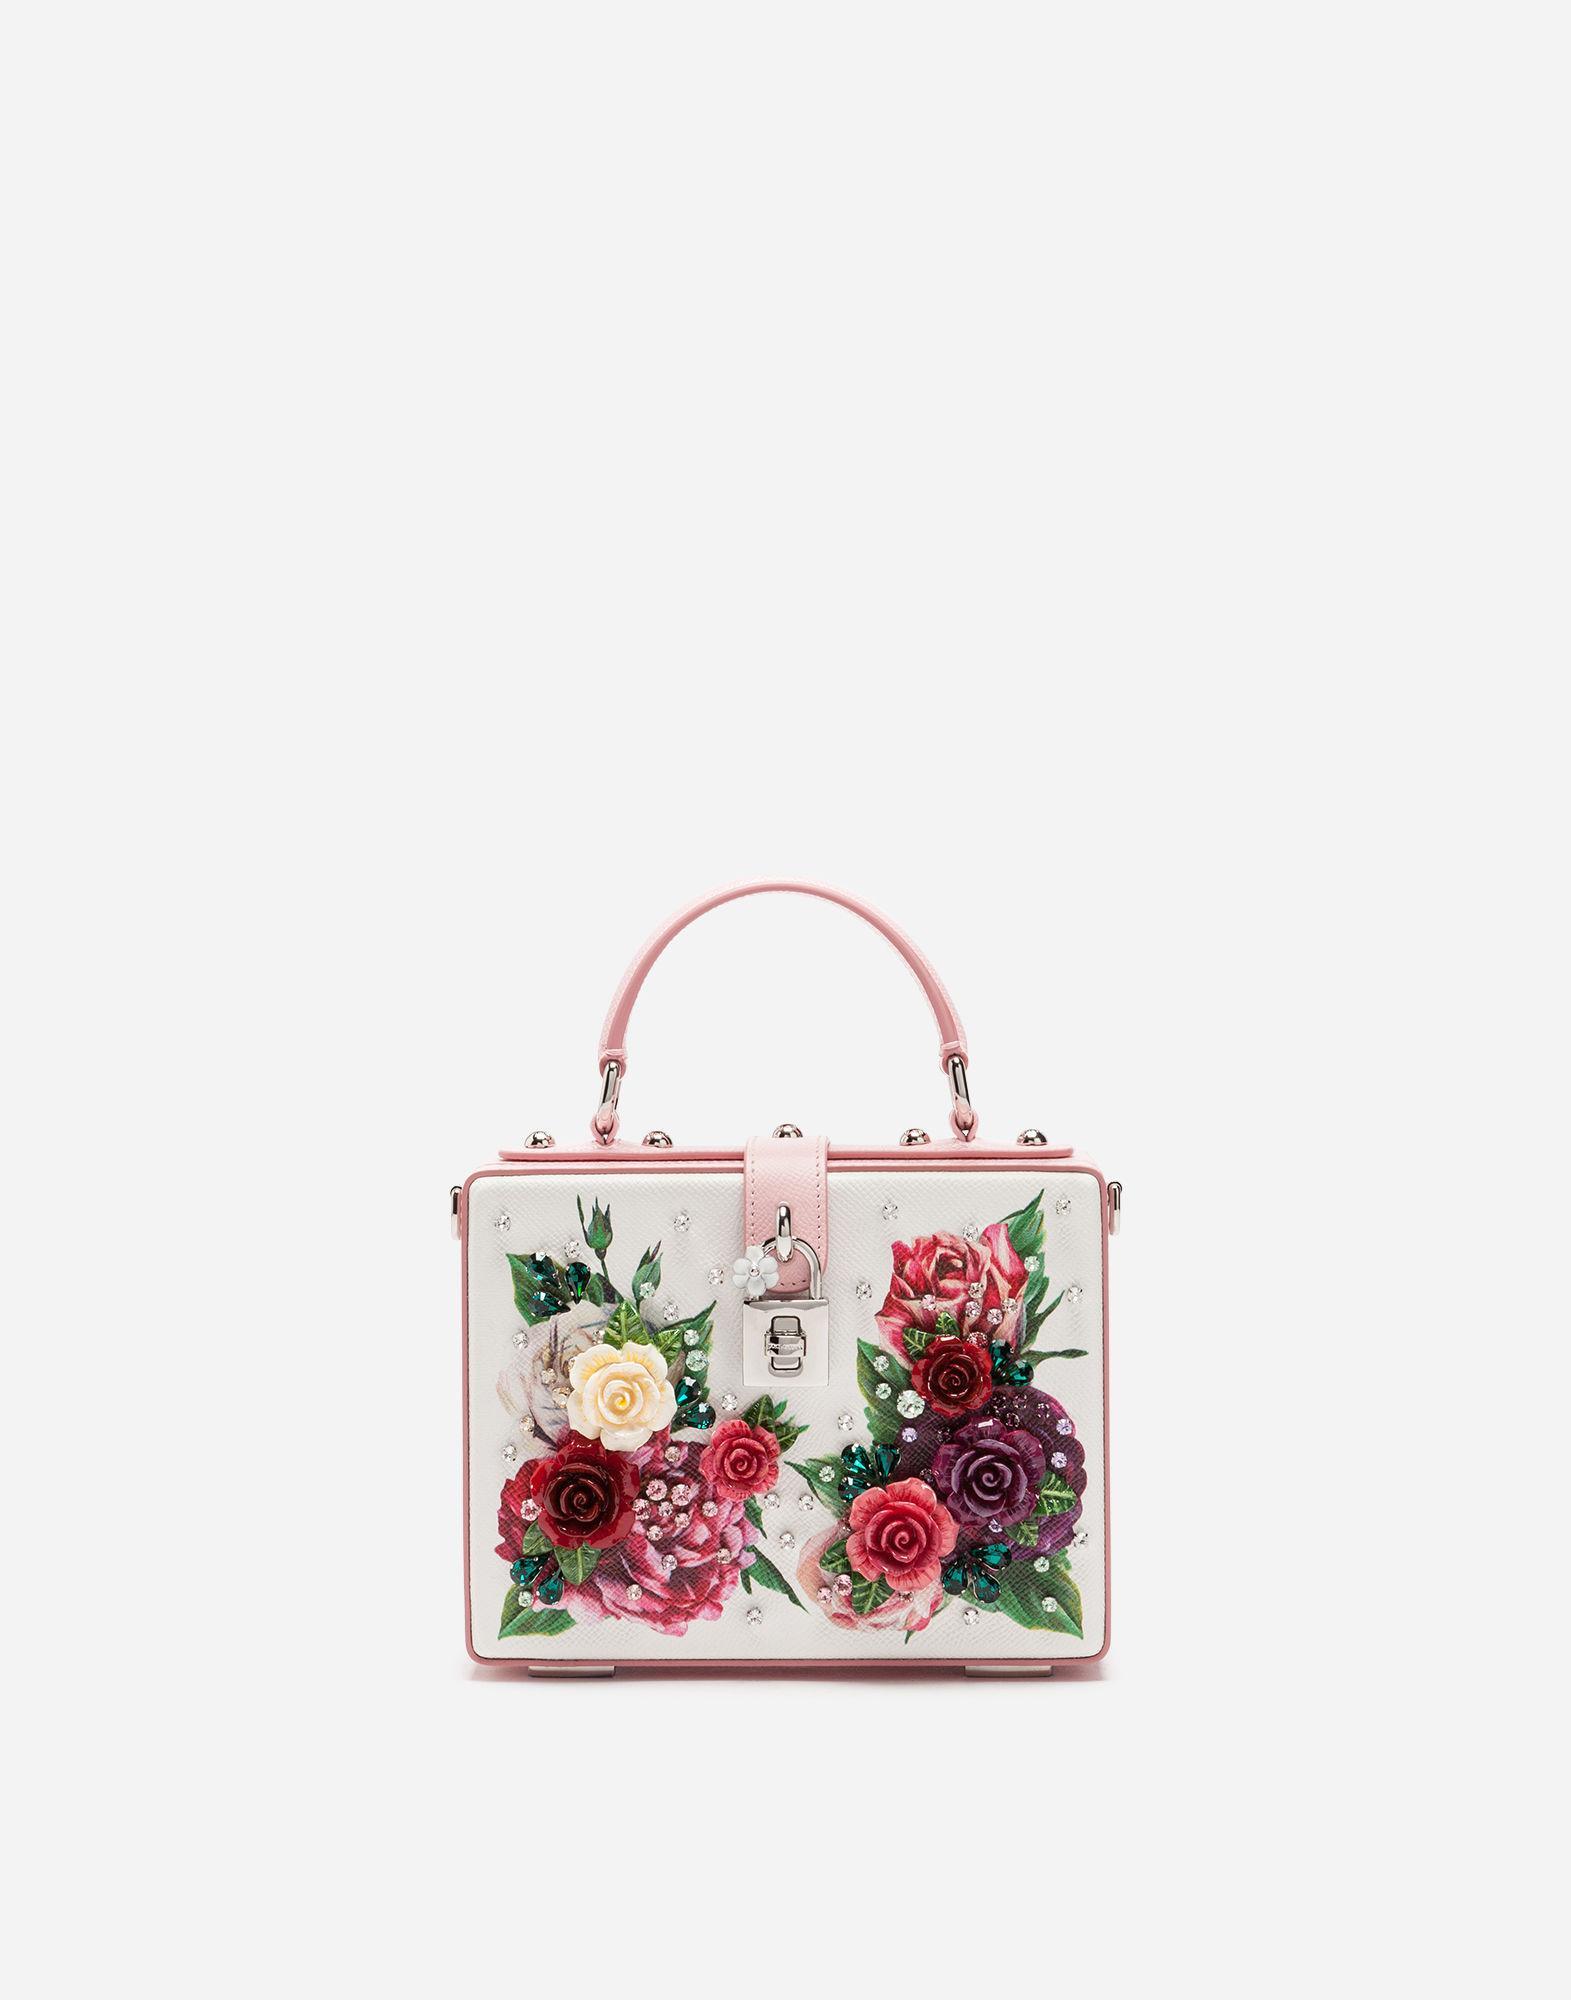 37d477a1ec Dolce & Gabbana Dolce Box Bag In Dauphine Calfskin In Multicolor ...